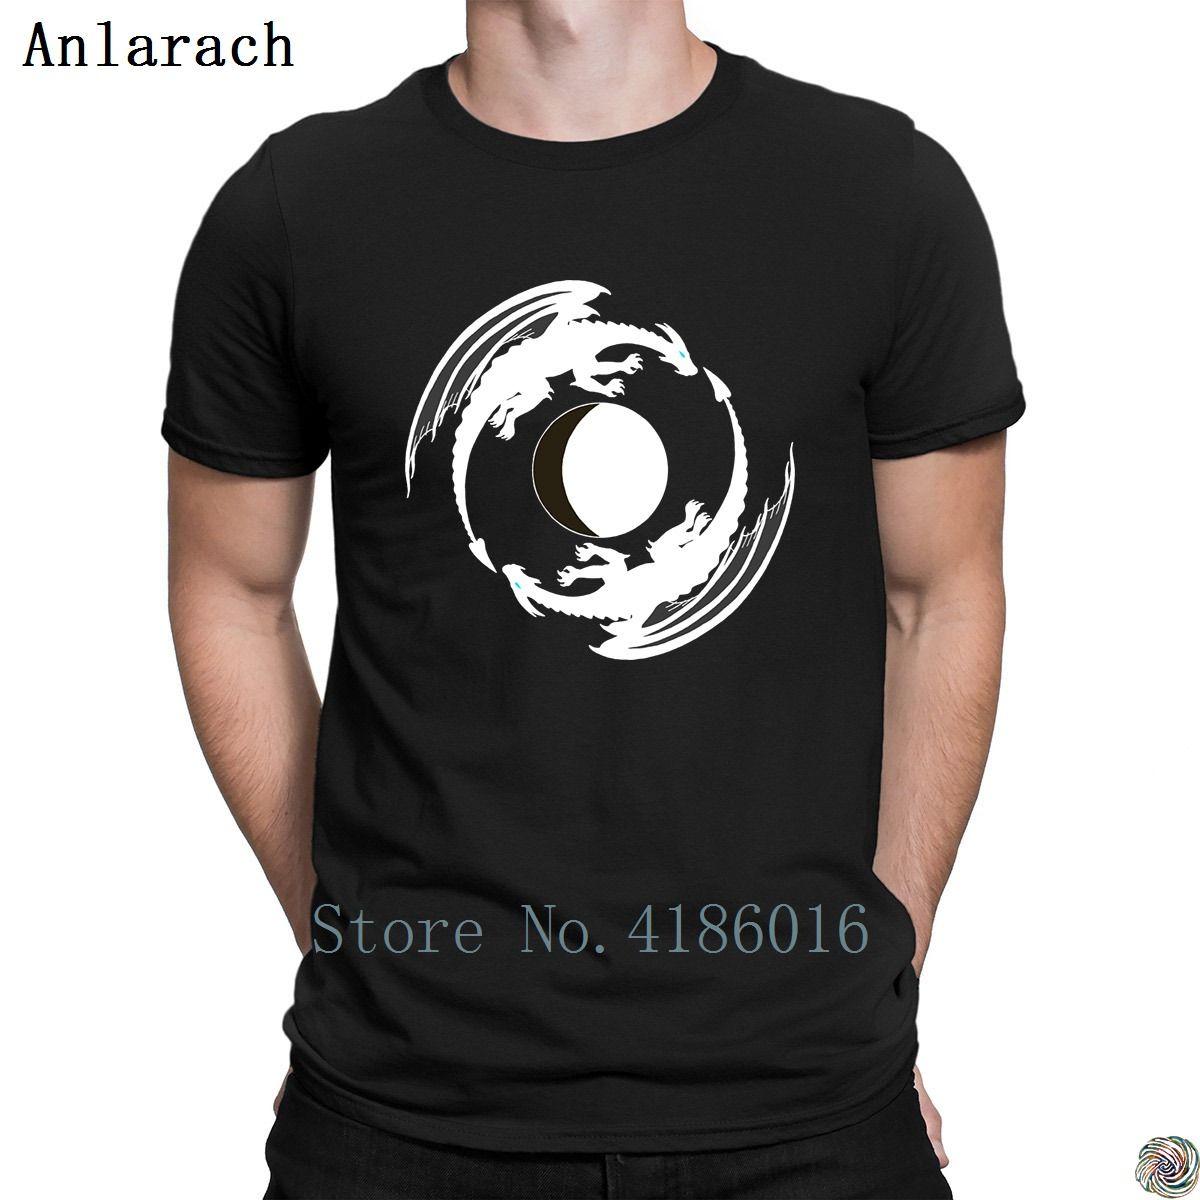 Mond-Drachen t-shirts Hip-Hop-Personality Sommer ursprüngliche Männer T-Shirt der neue Street Short Sleeve Fit